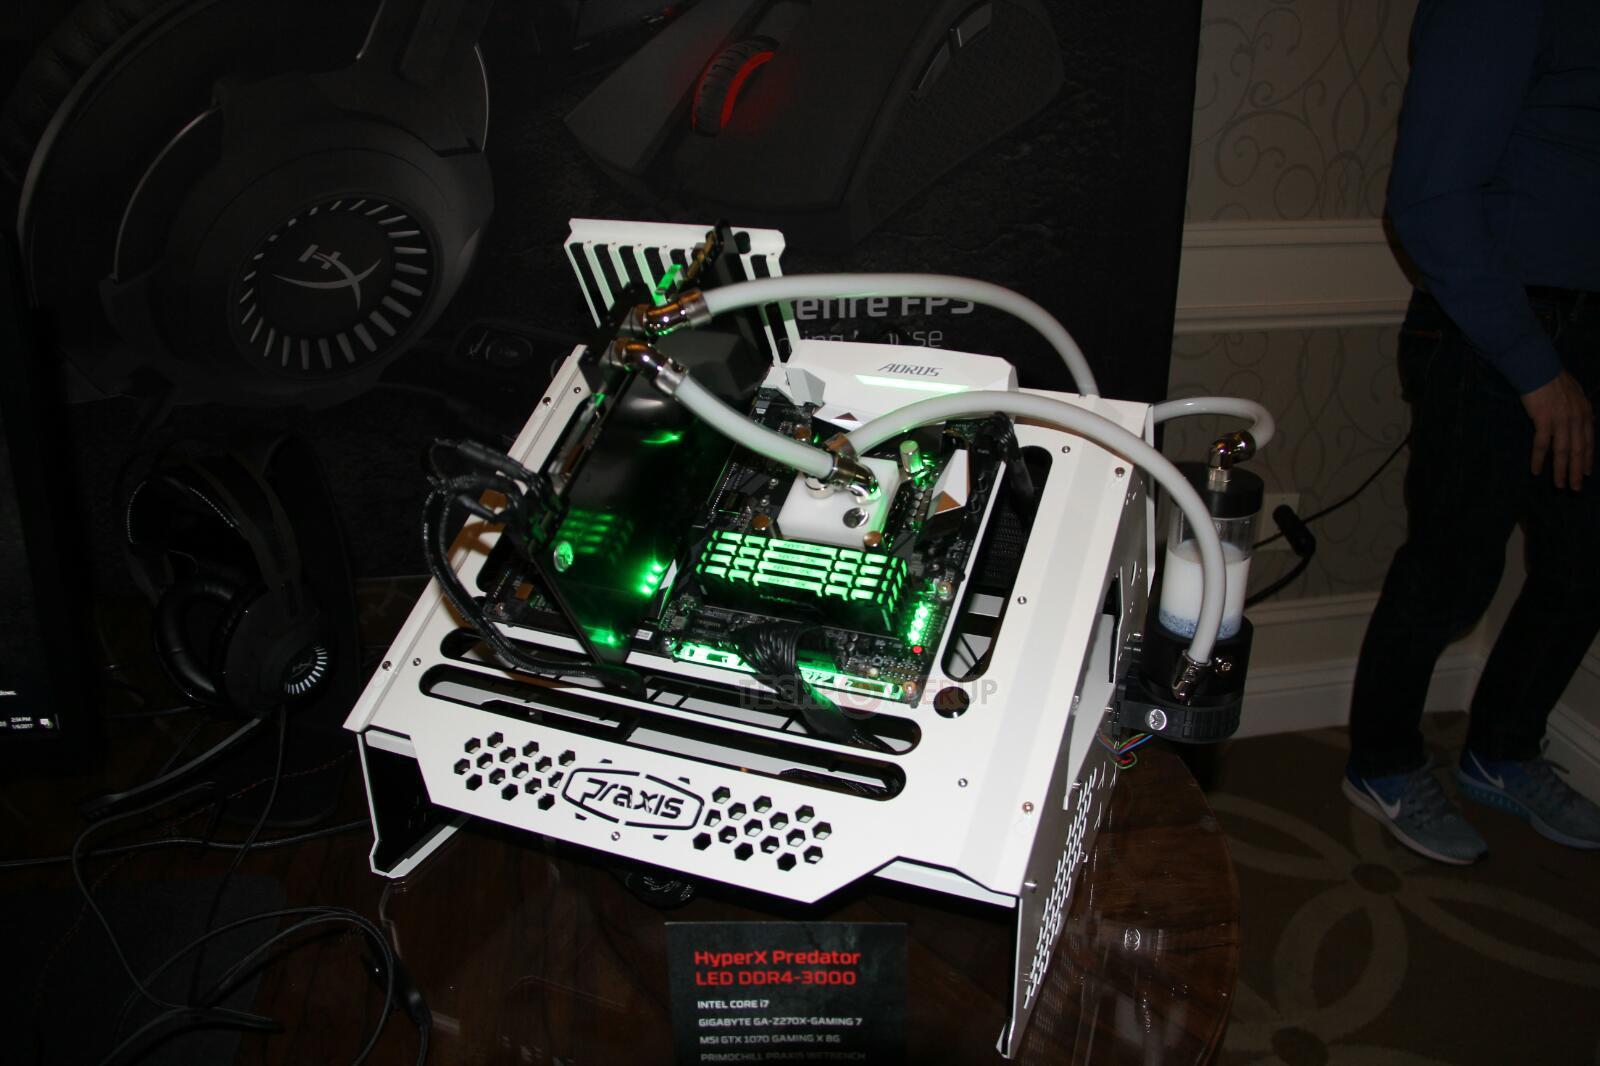 Kingston HyperX Predator mit RGB-LEDs beleuchtet in grün